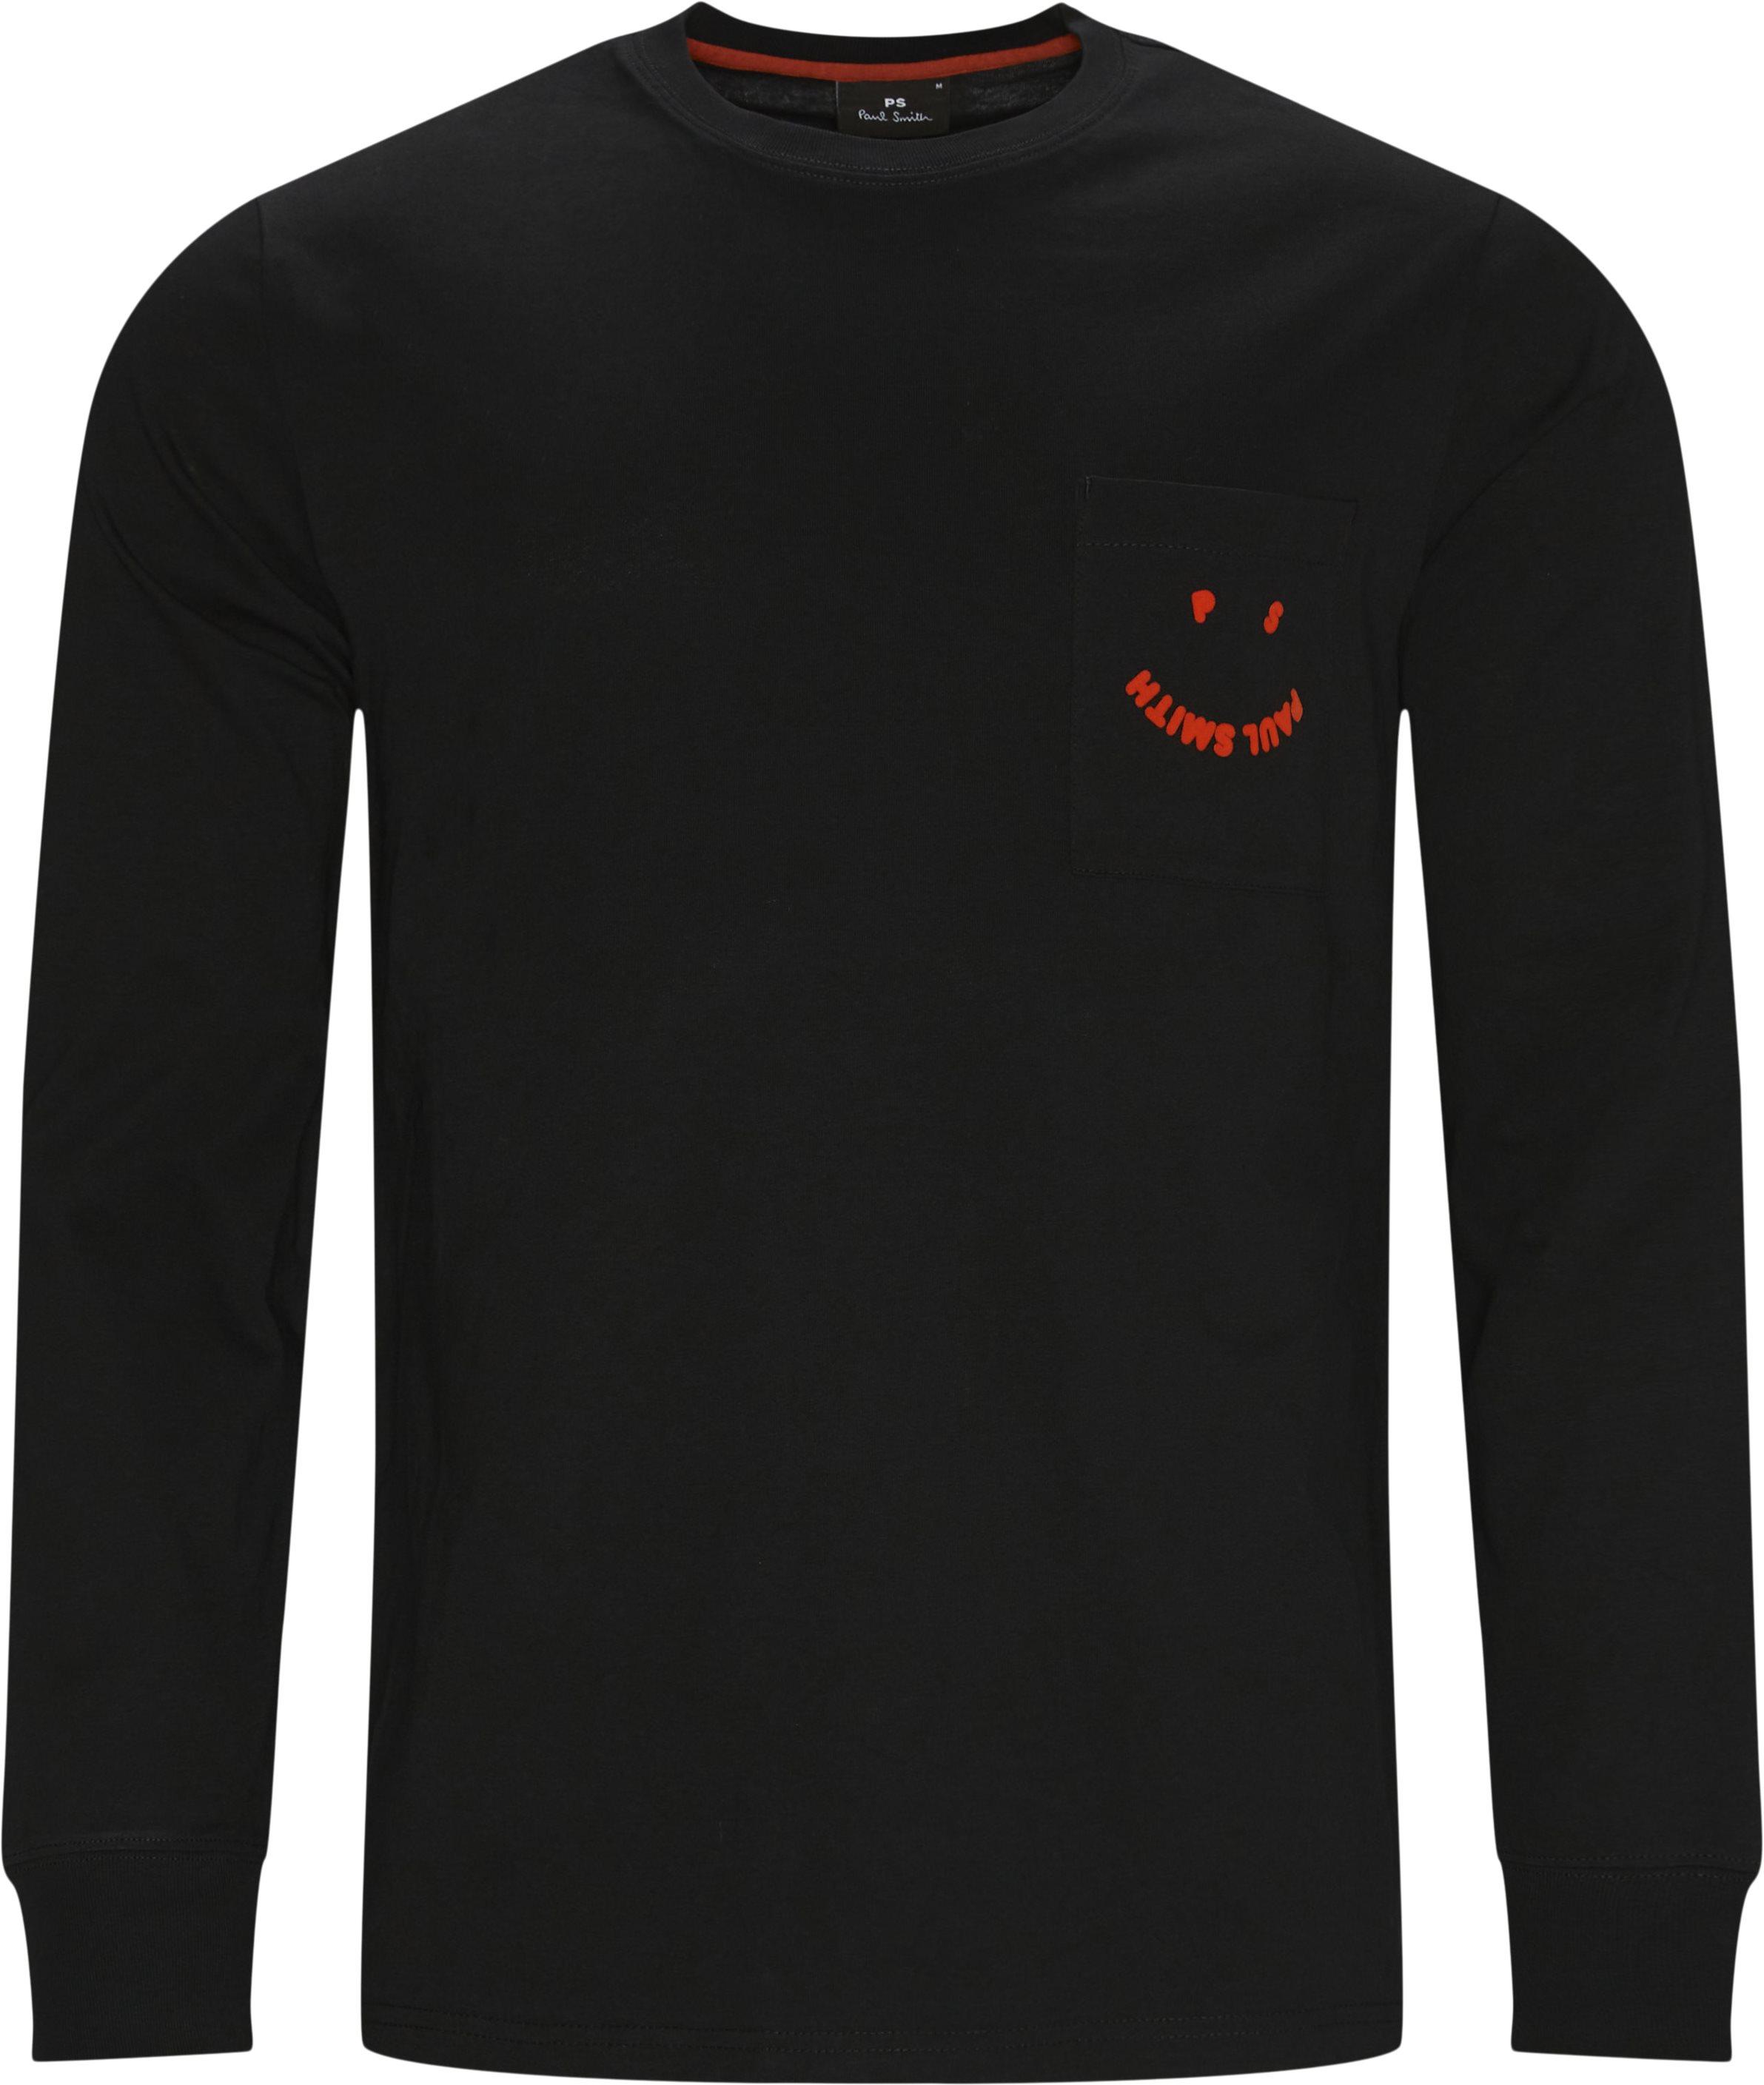 Long-sleeved t-shirts - Regular fit - Black